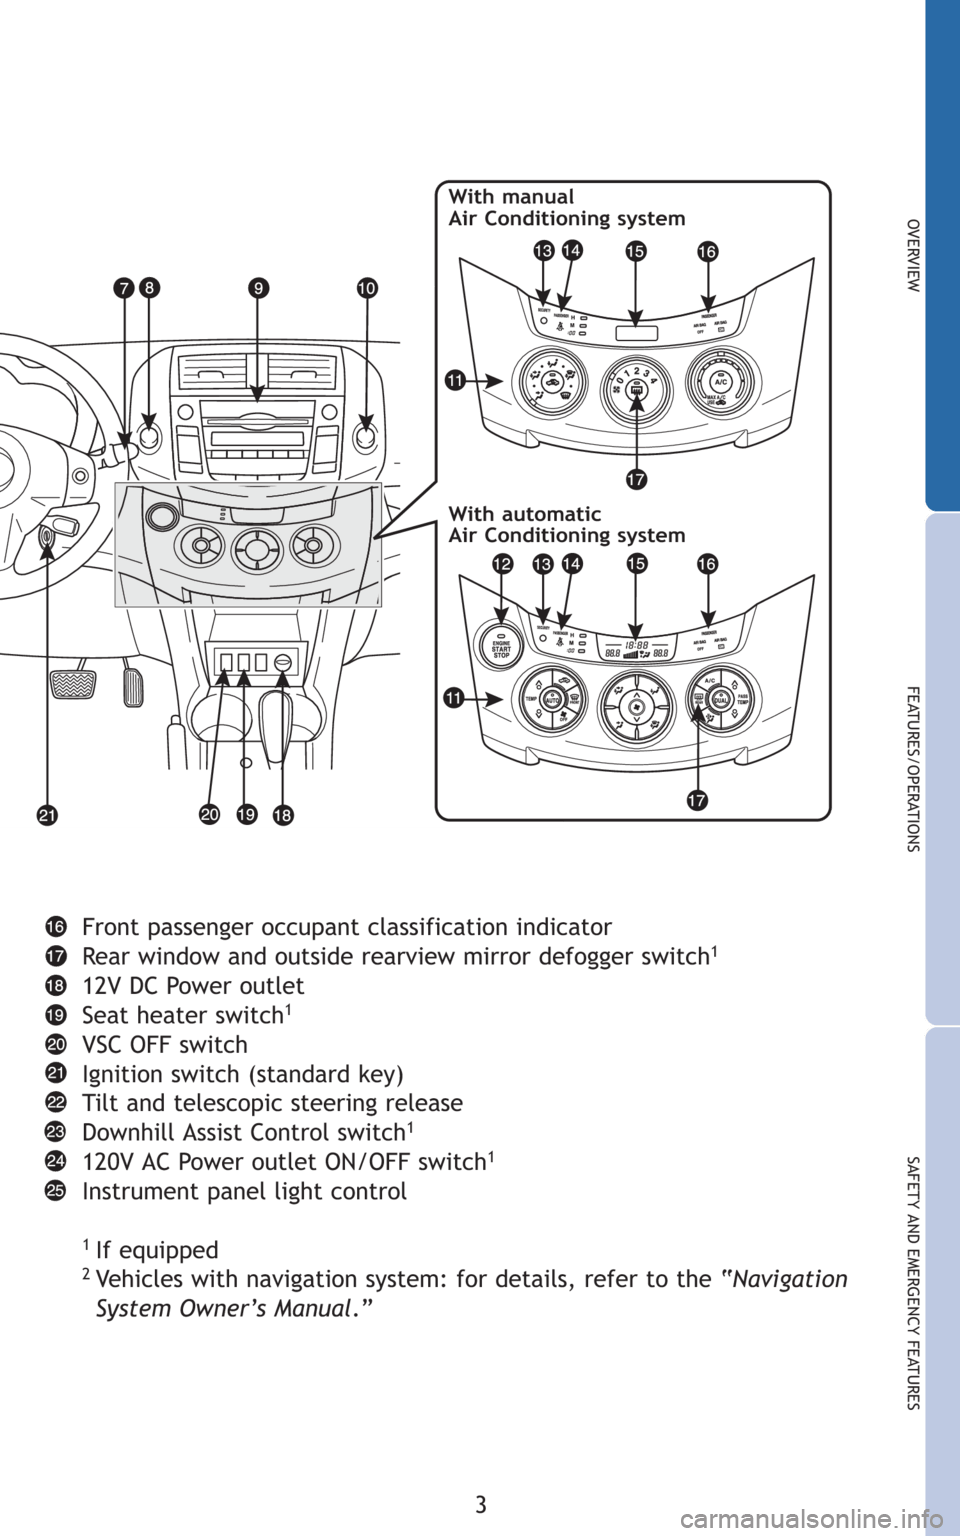 TOYOTA RAV4 2010 XA30 / 3.G Quick Reference Guide